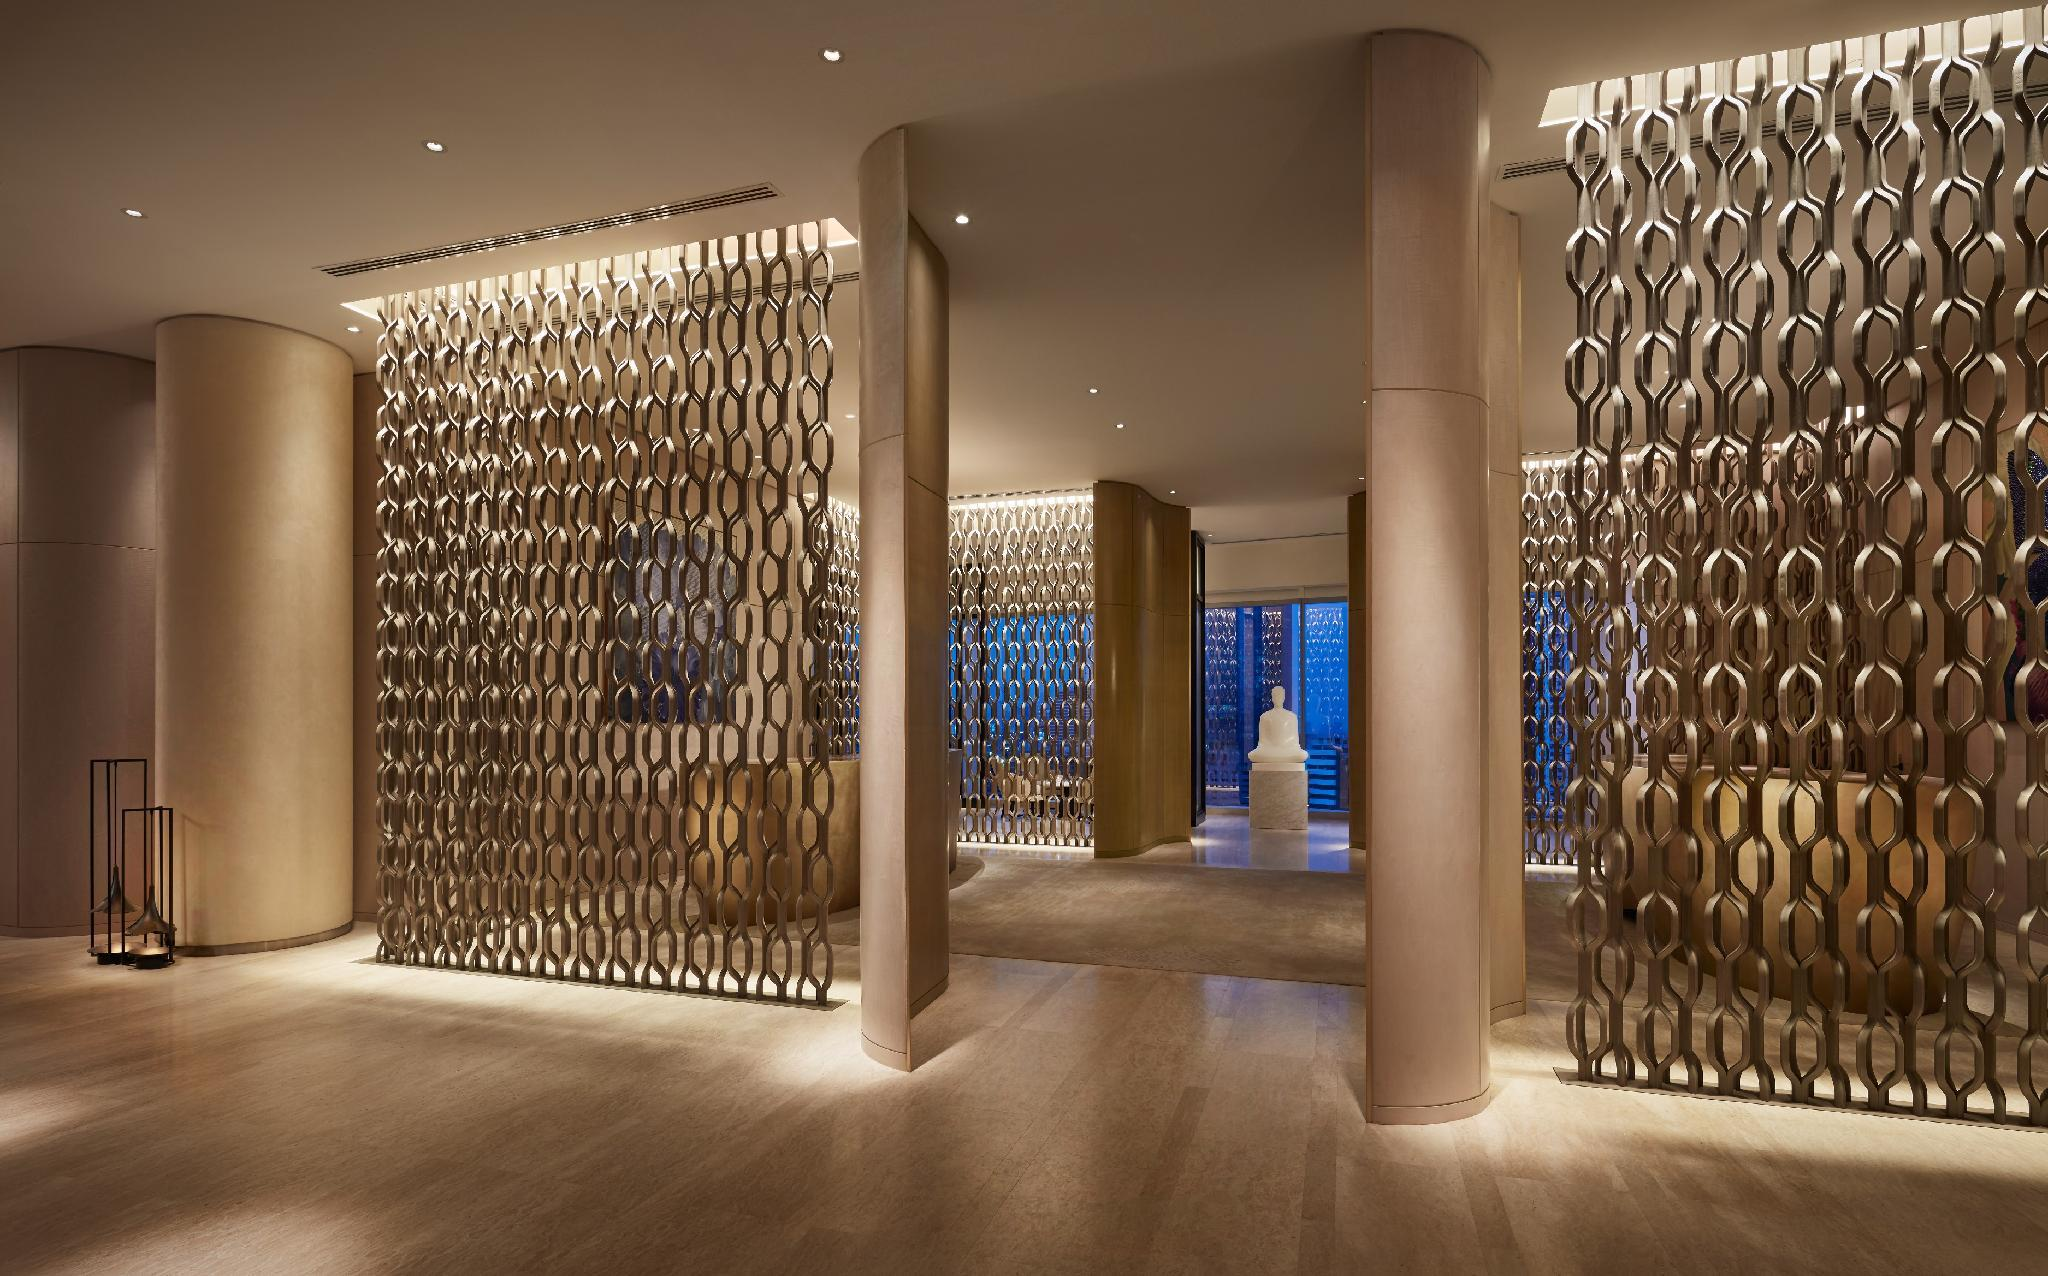 曼谷曼谷柏悅飯店 (Park Hyatt Bangkok)線上訂房|Agoda.com